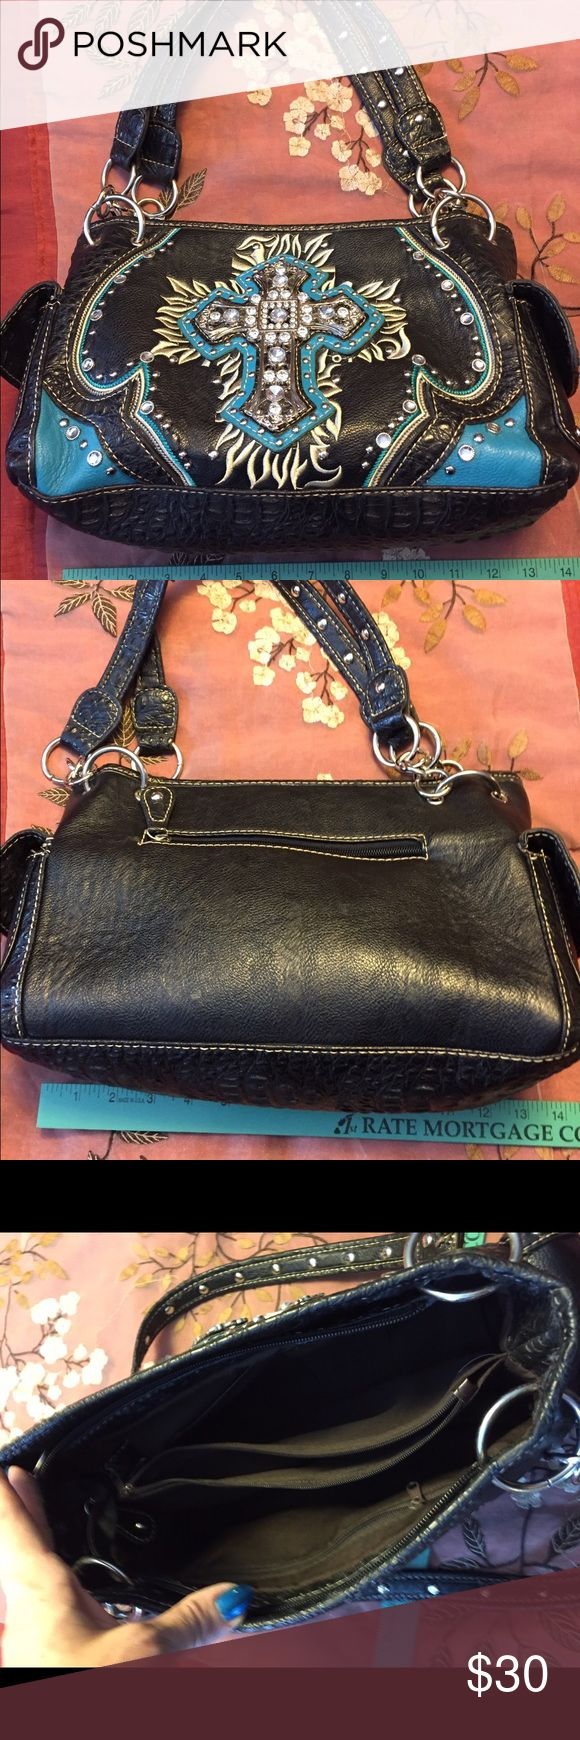 No name brand Handbag Gently loved. Bags Shoulder Bags